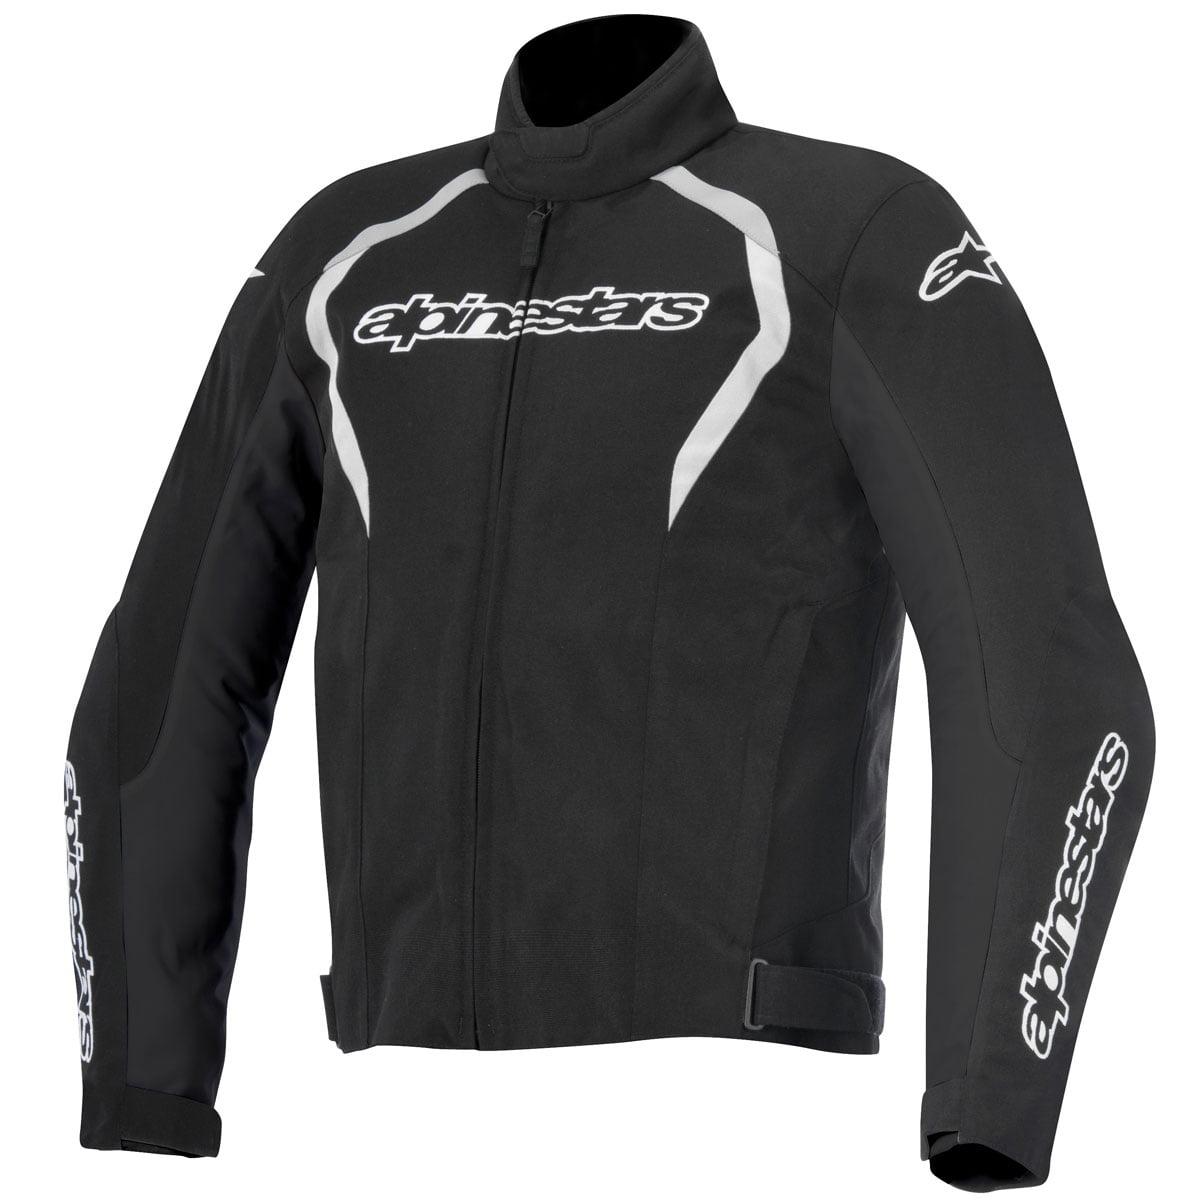 Alpinestars Fastback Mens Waterproof Textile Jacket Black/White